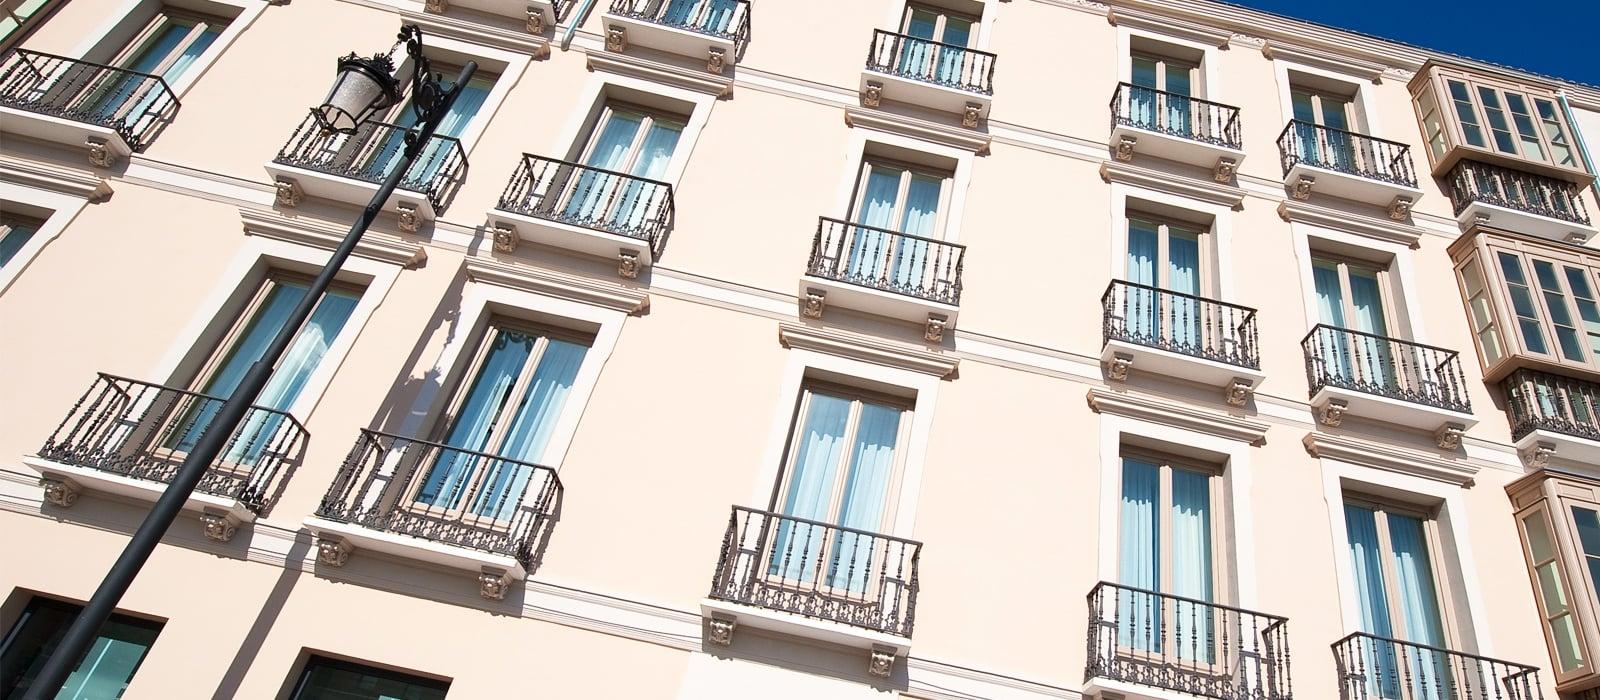 Hotel M 225 Laga Posada Del Patio Vincci Hoteles